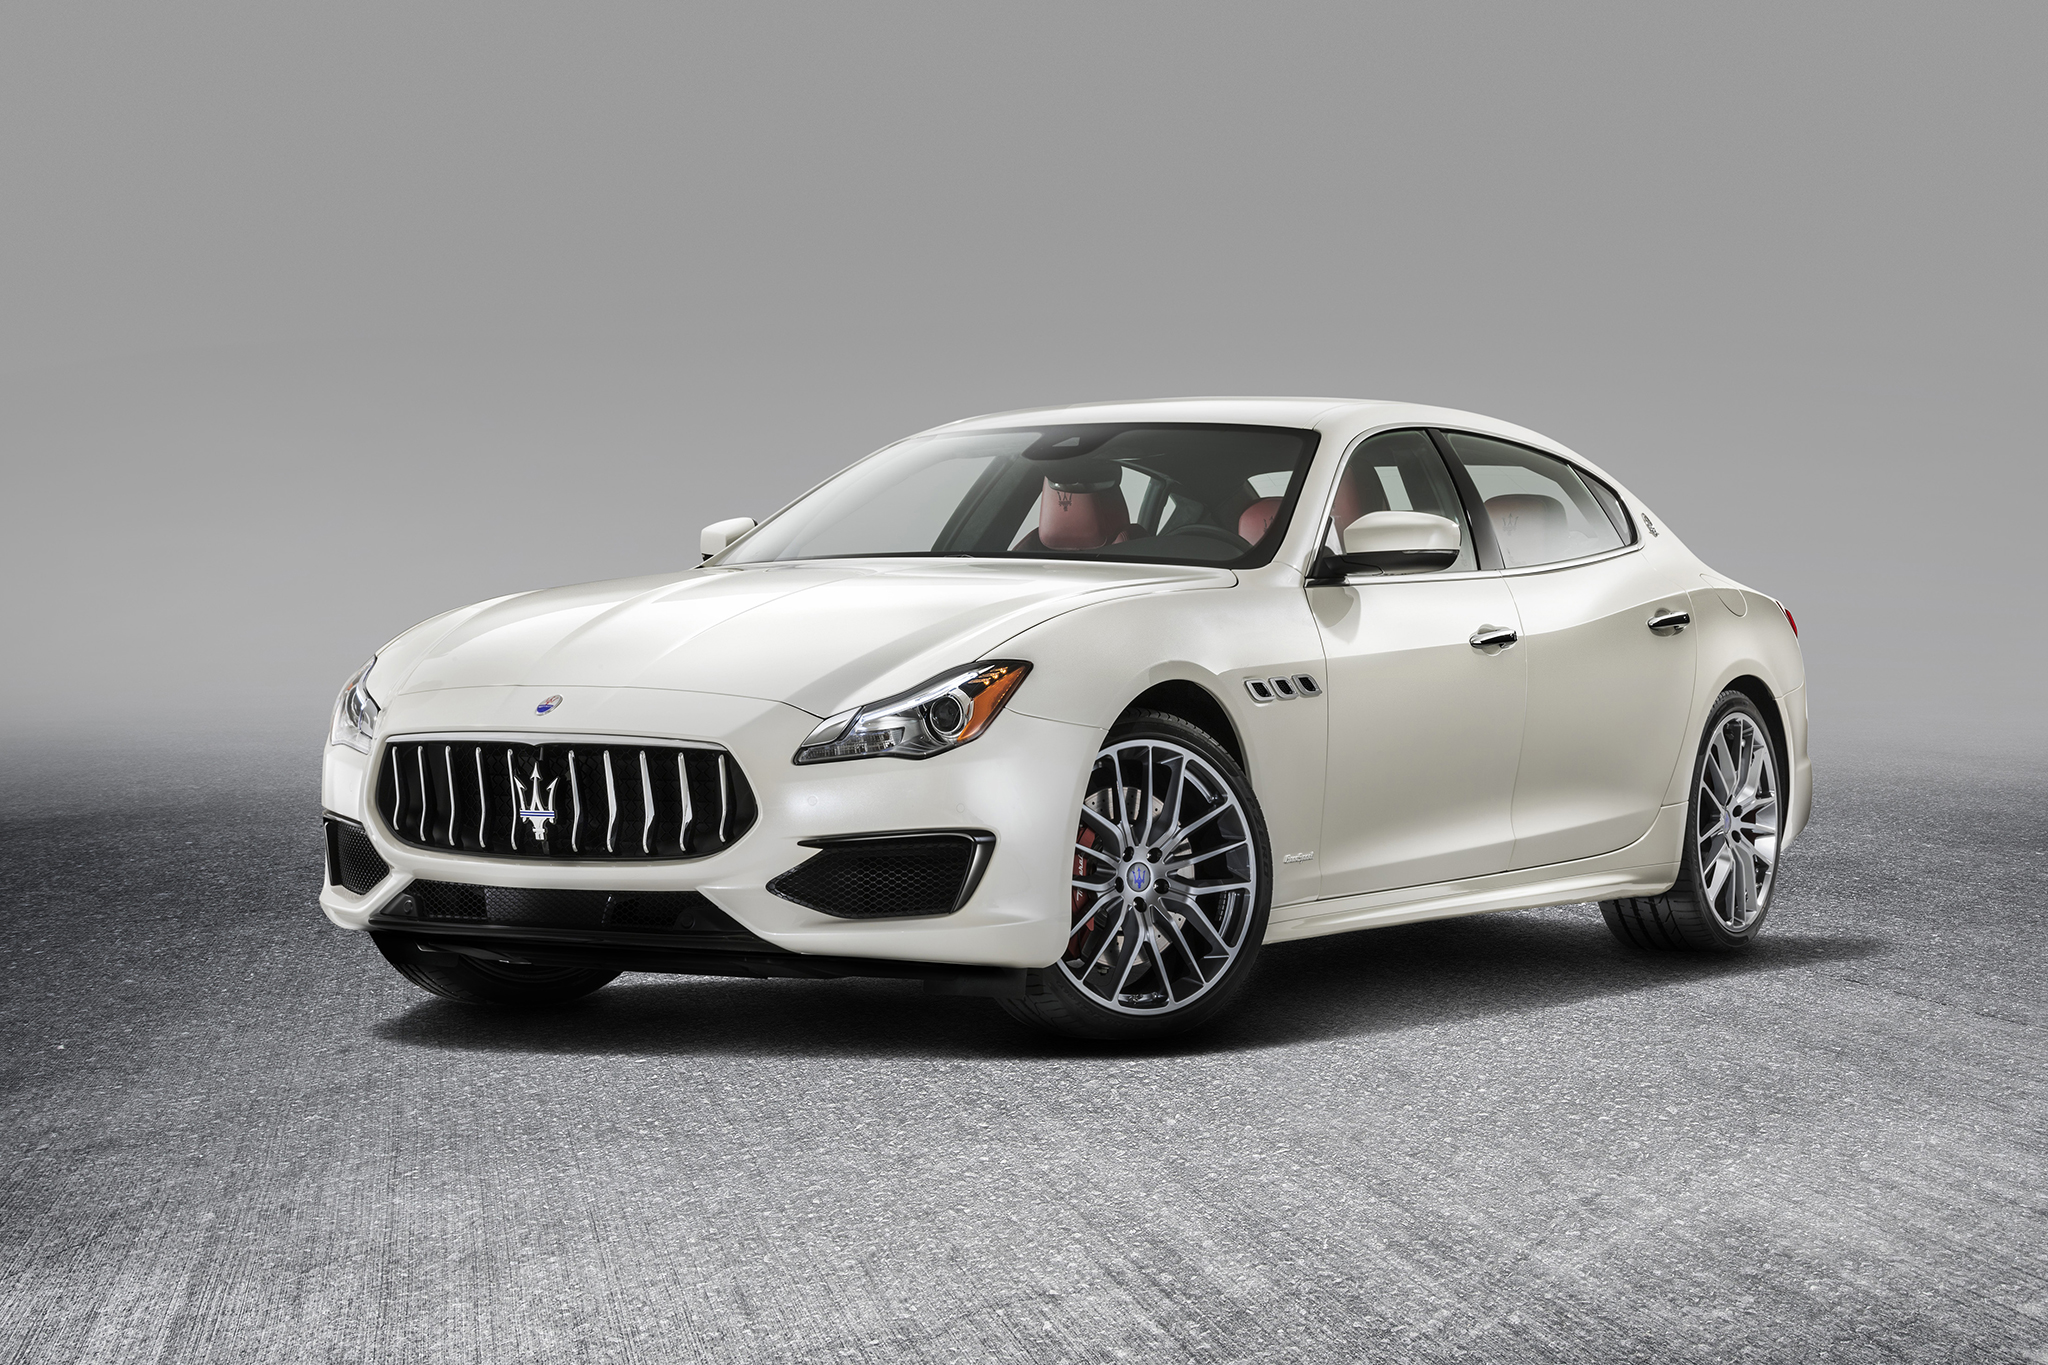 2017 Maserati Ghibli Sport Sedan Lease Special – Carscouts